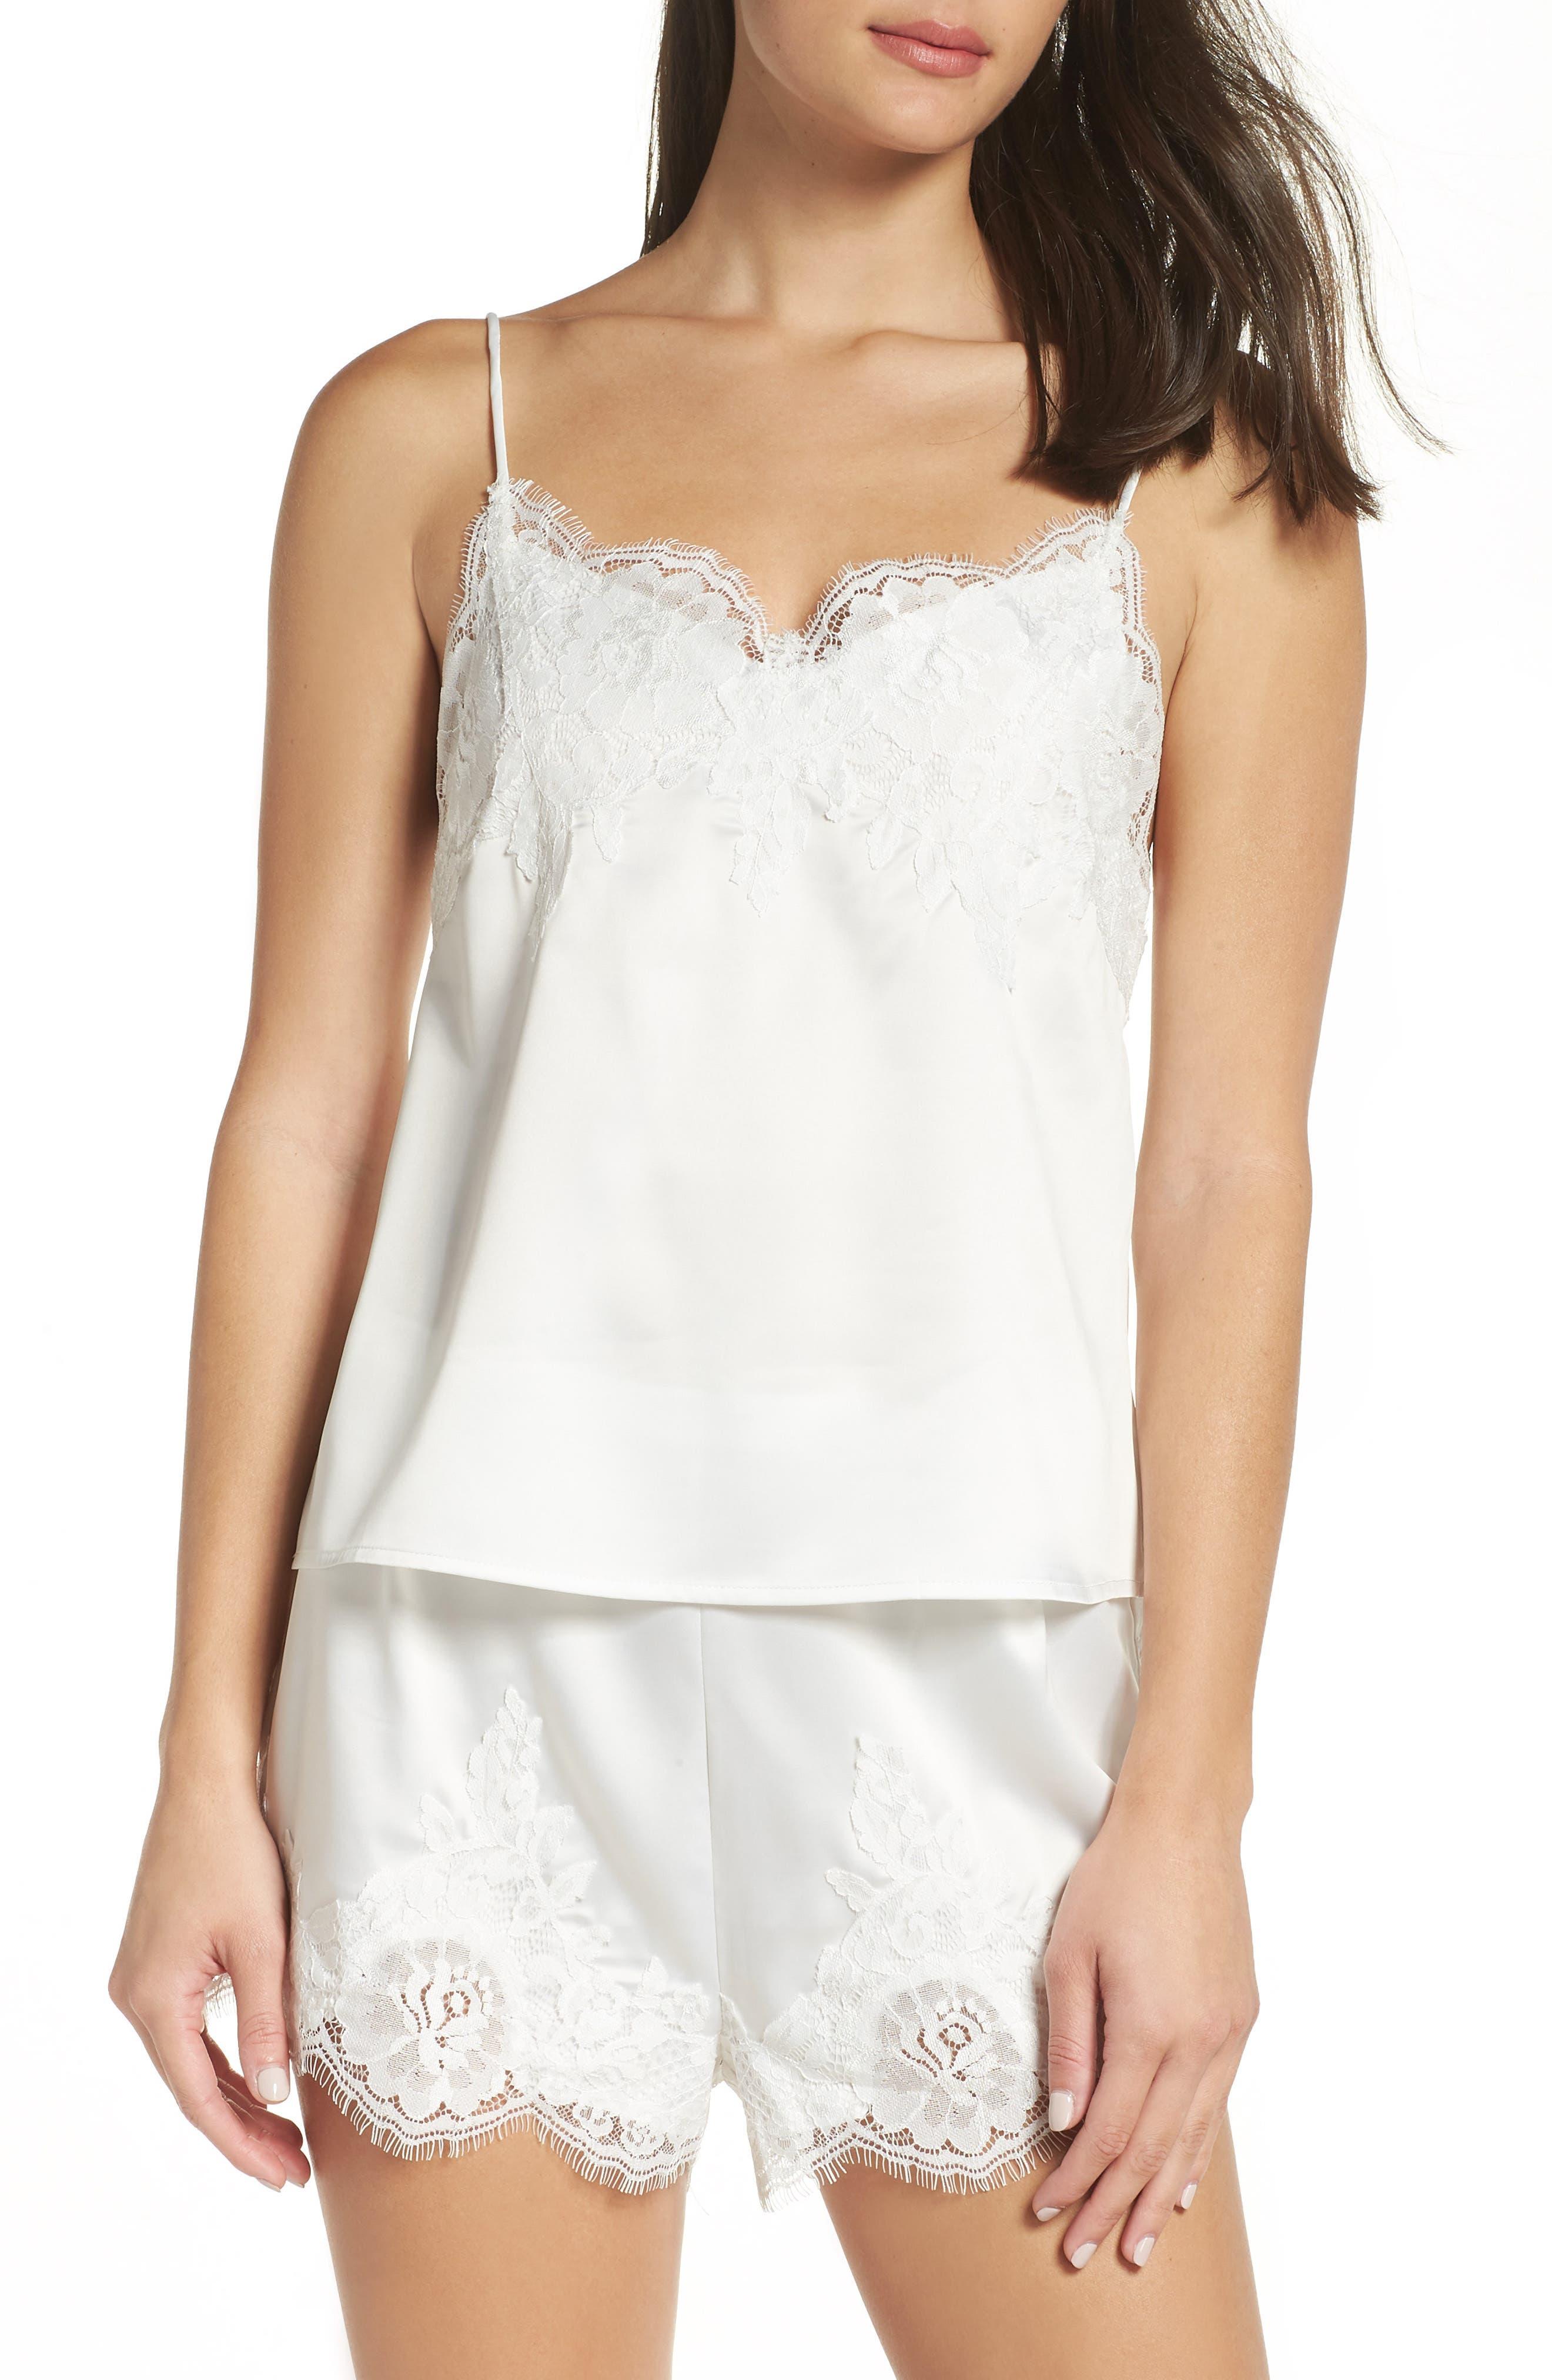 HOMEBODII Olivia Short Pajamas in White